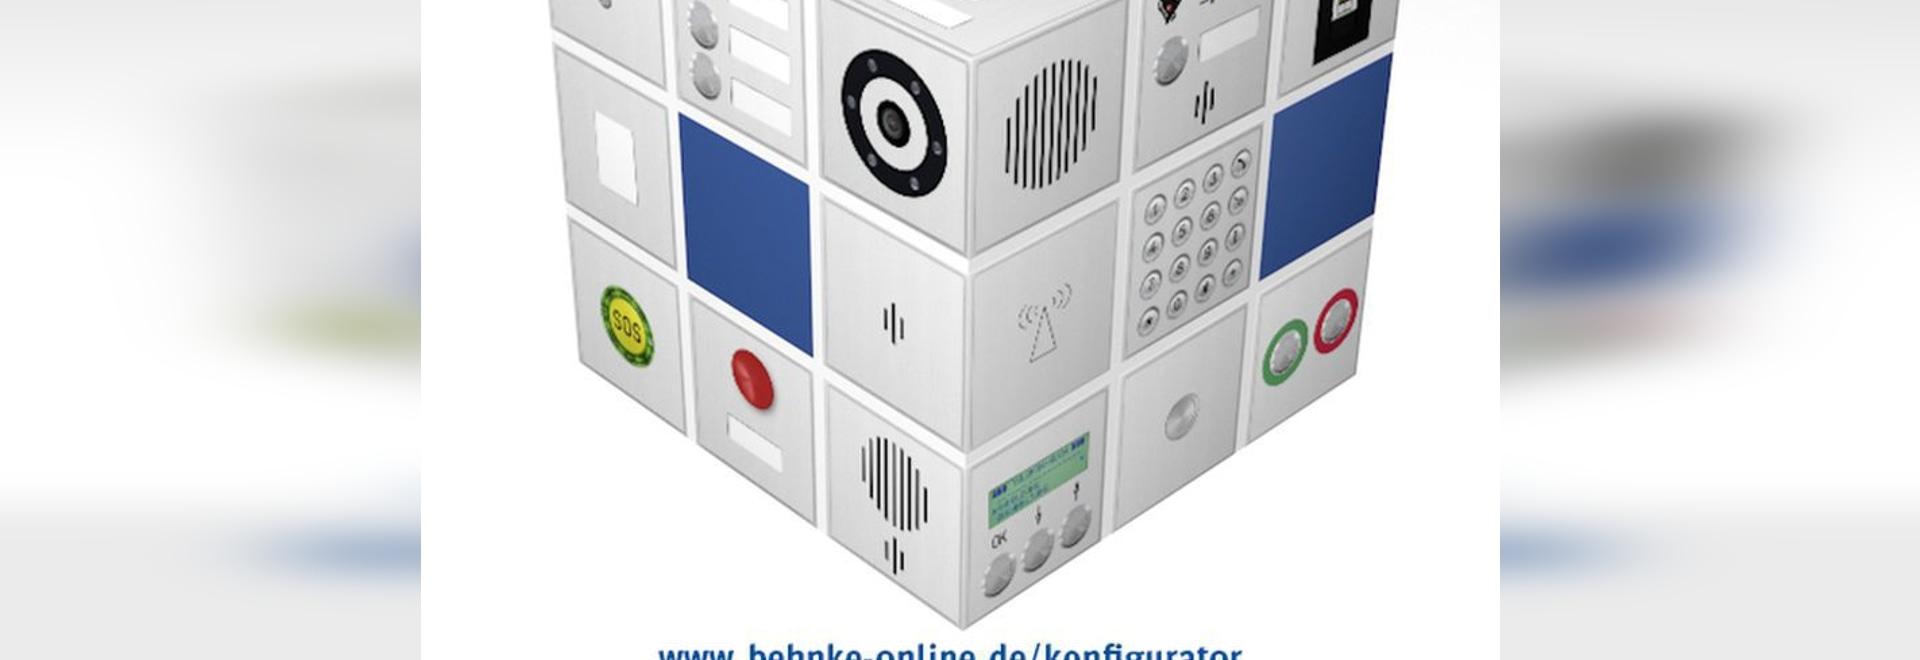 Behnke Online-Konfigurator